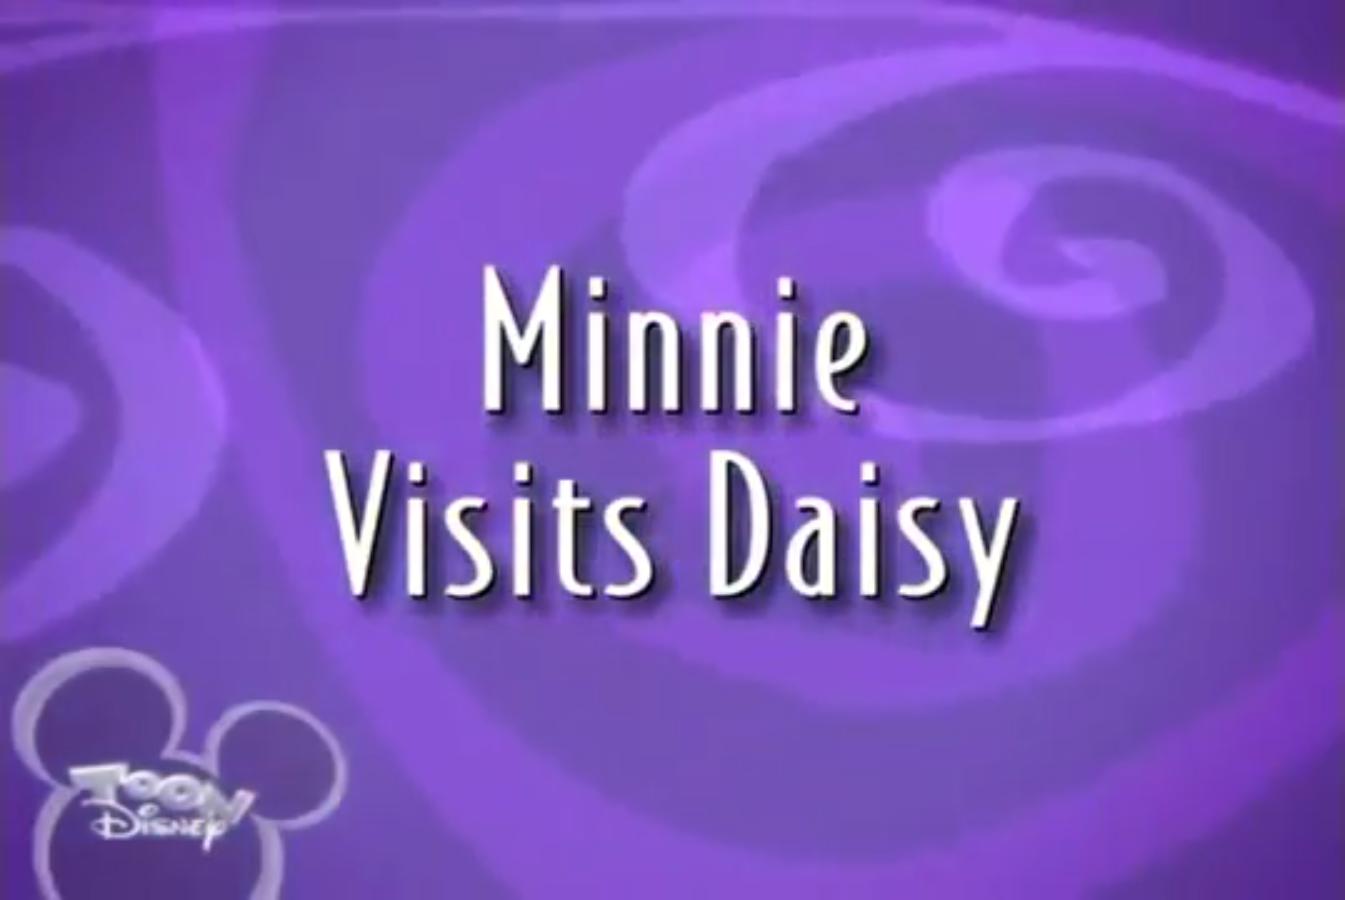 Minnie Visits Daisy